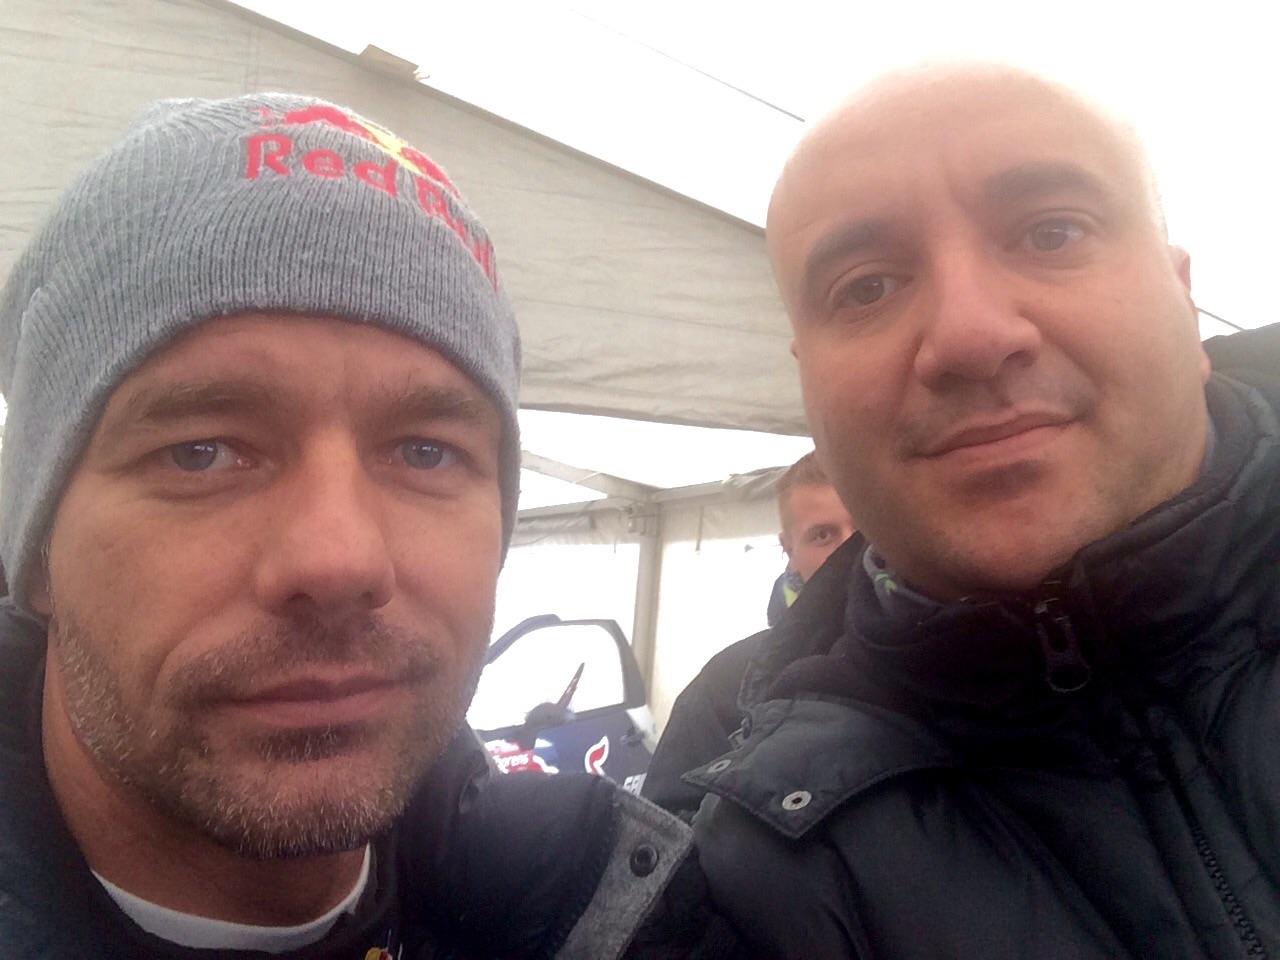 Taxi Albertville et Sébastien Loeb